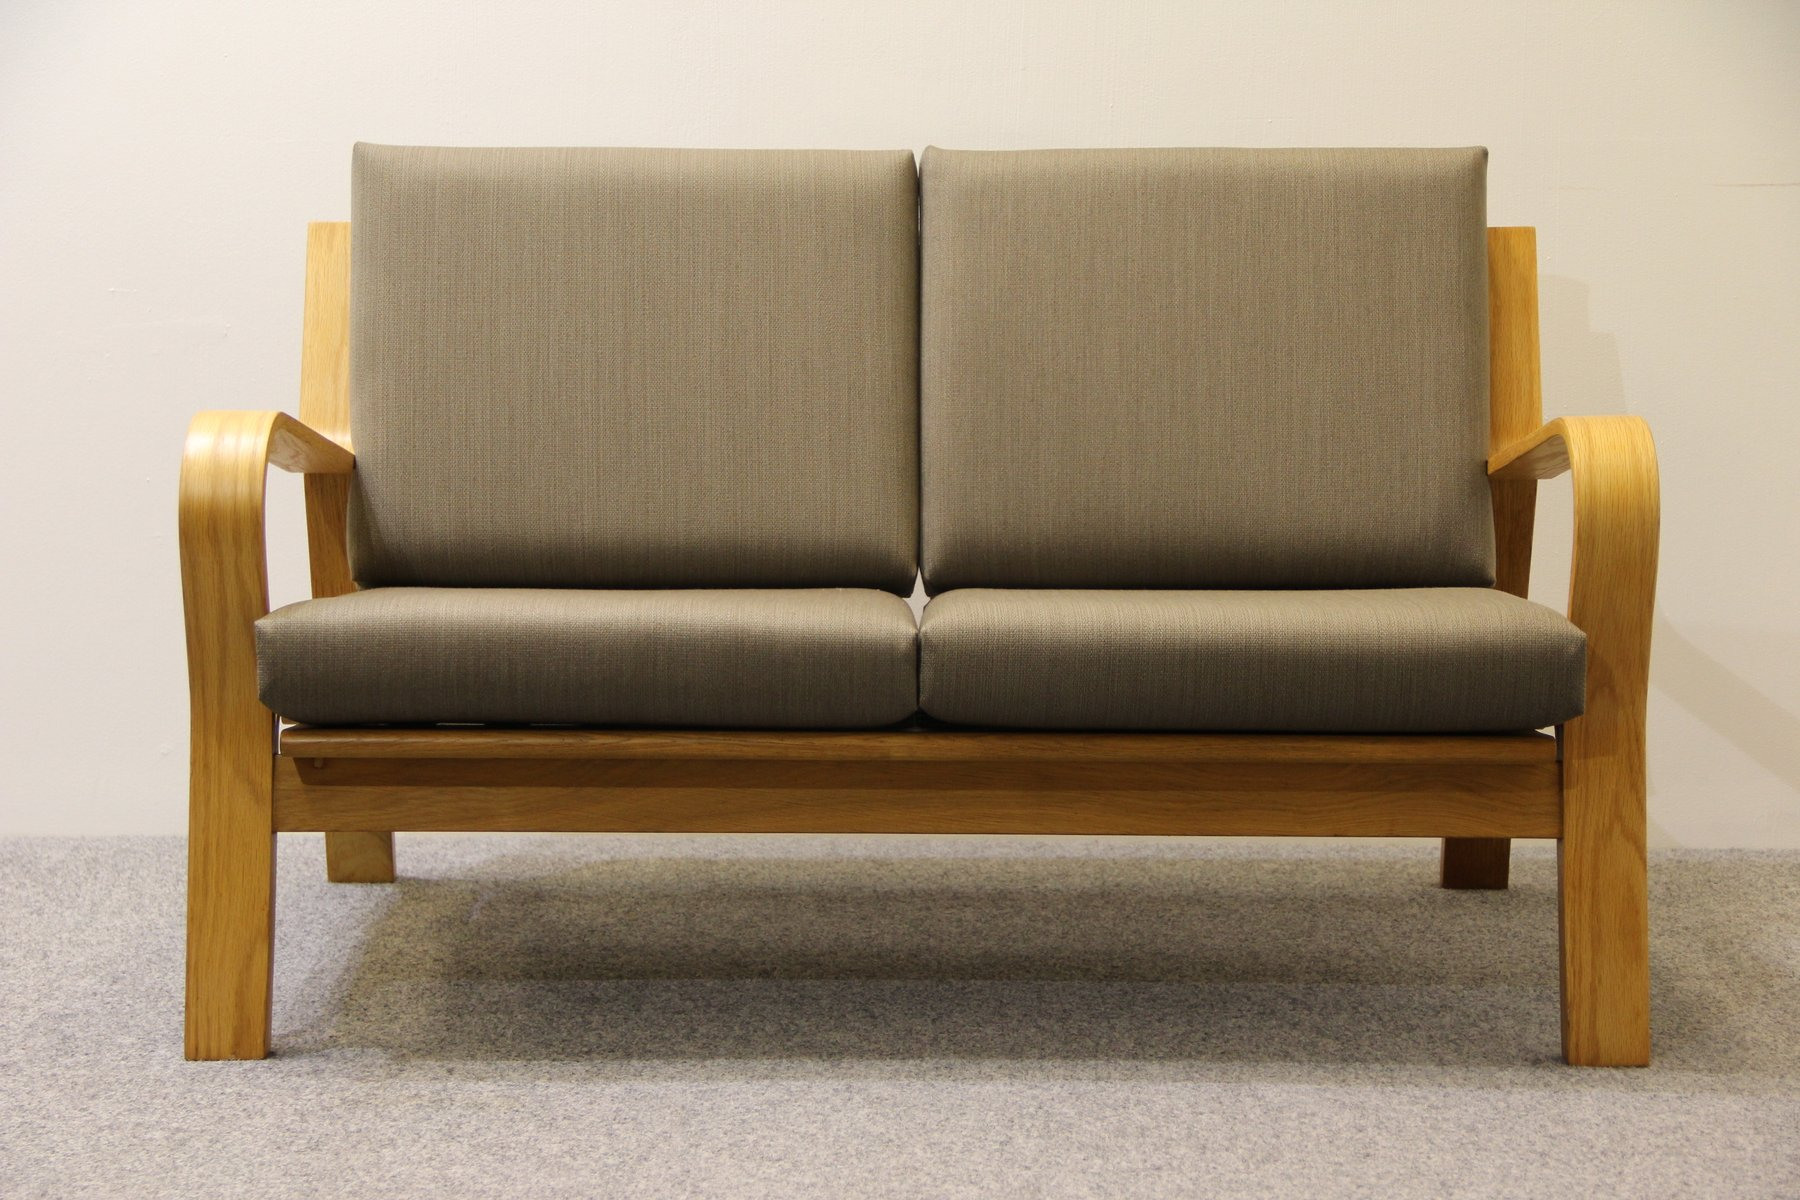 Vintage GE 671 Two Seater Sofa by Hans J Wegner for Getama for